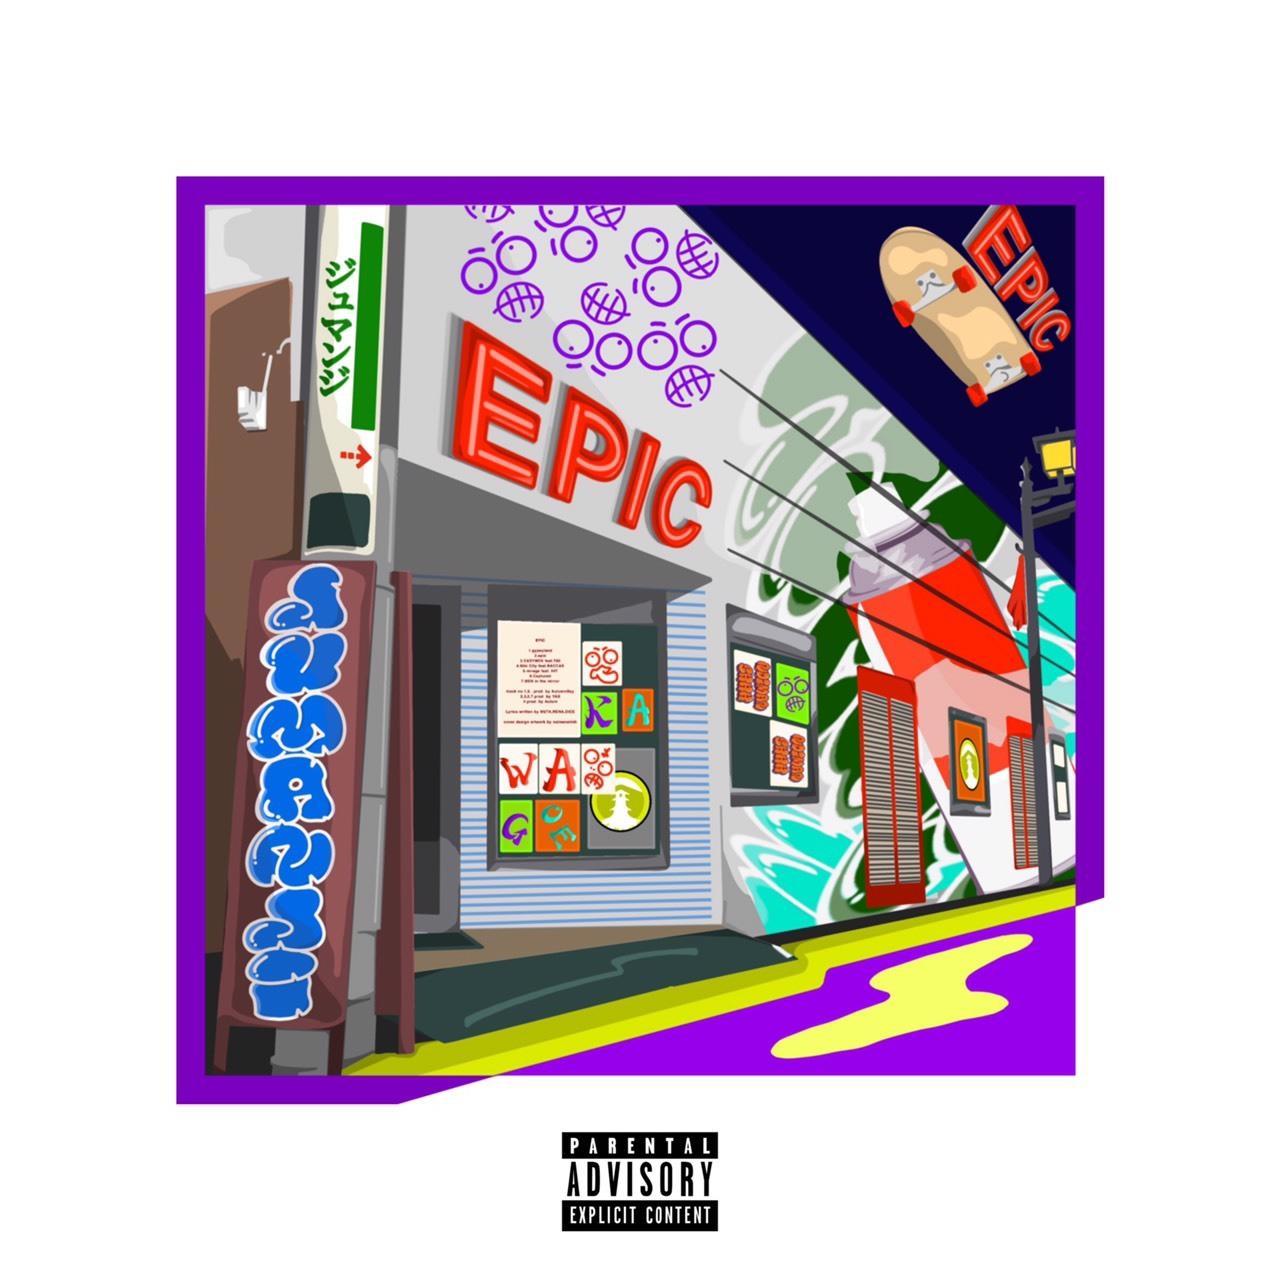 [CD] JUMANJI / EPIC